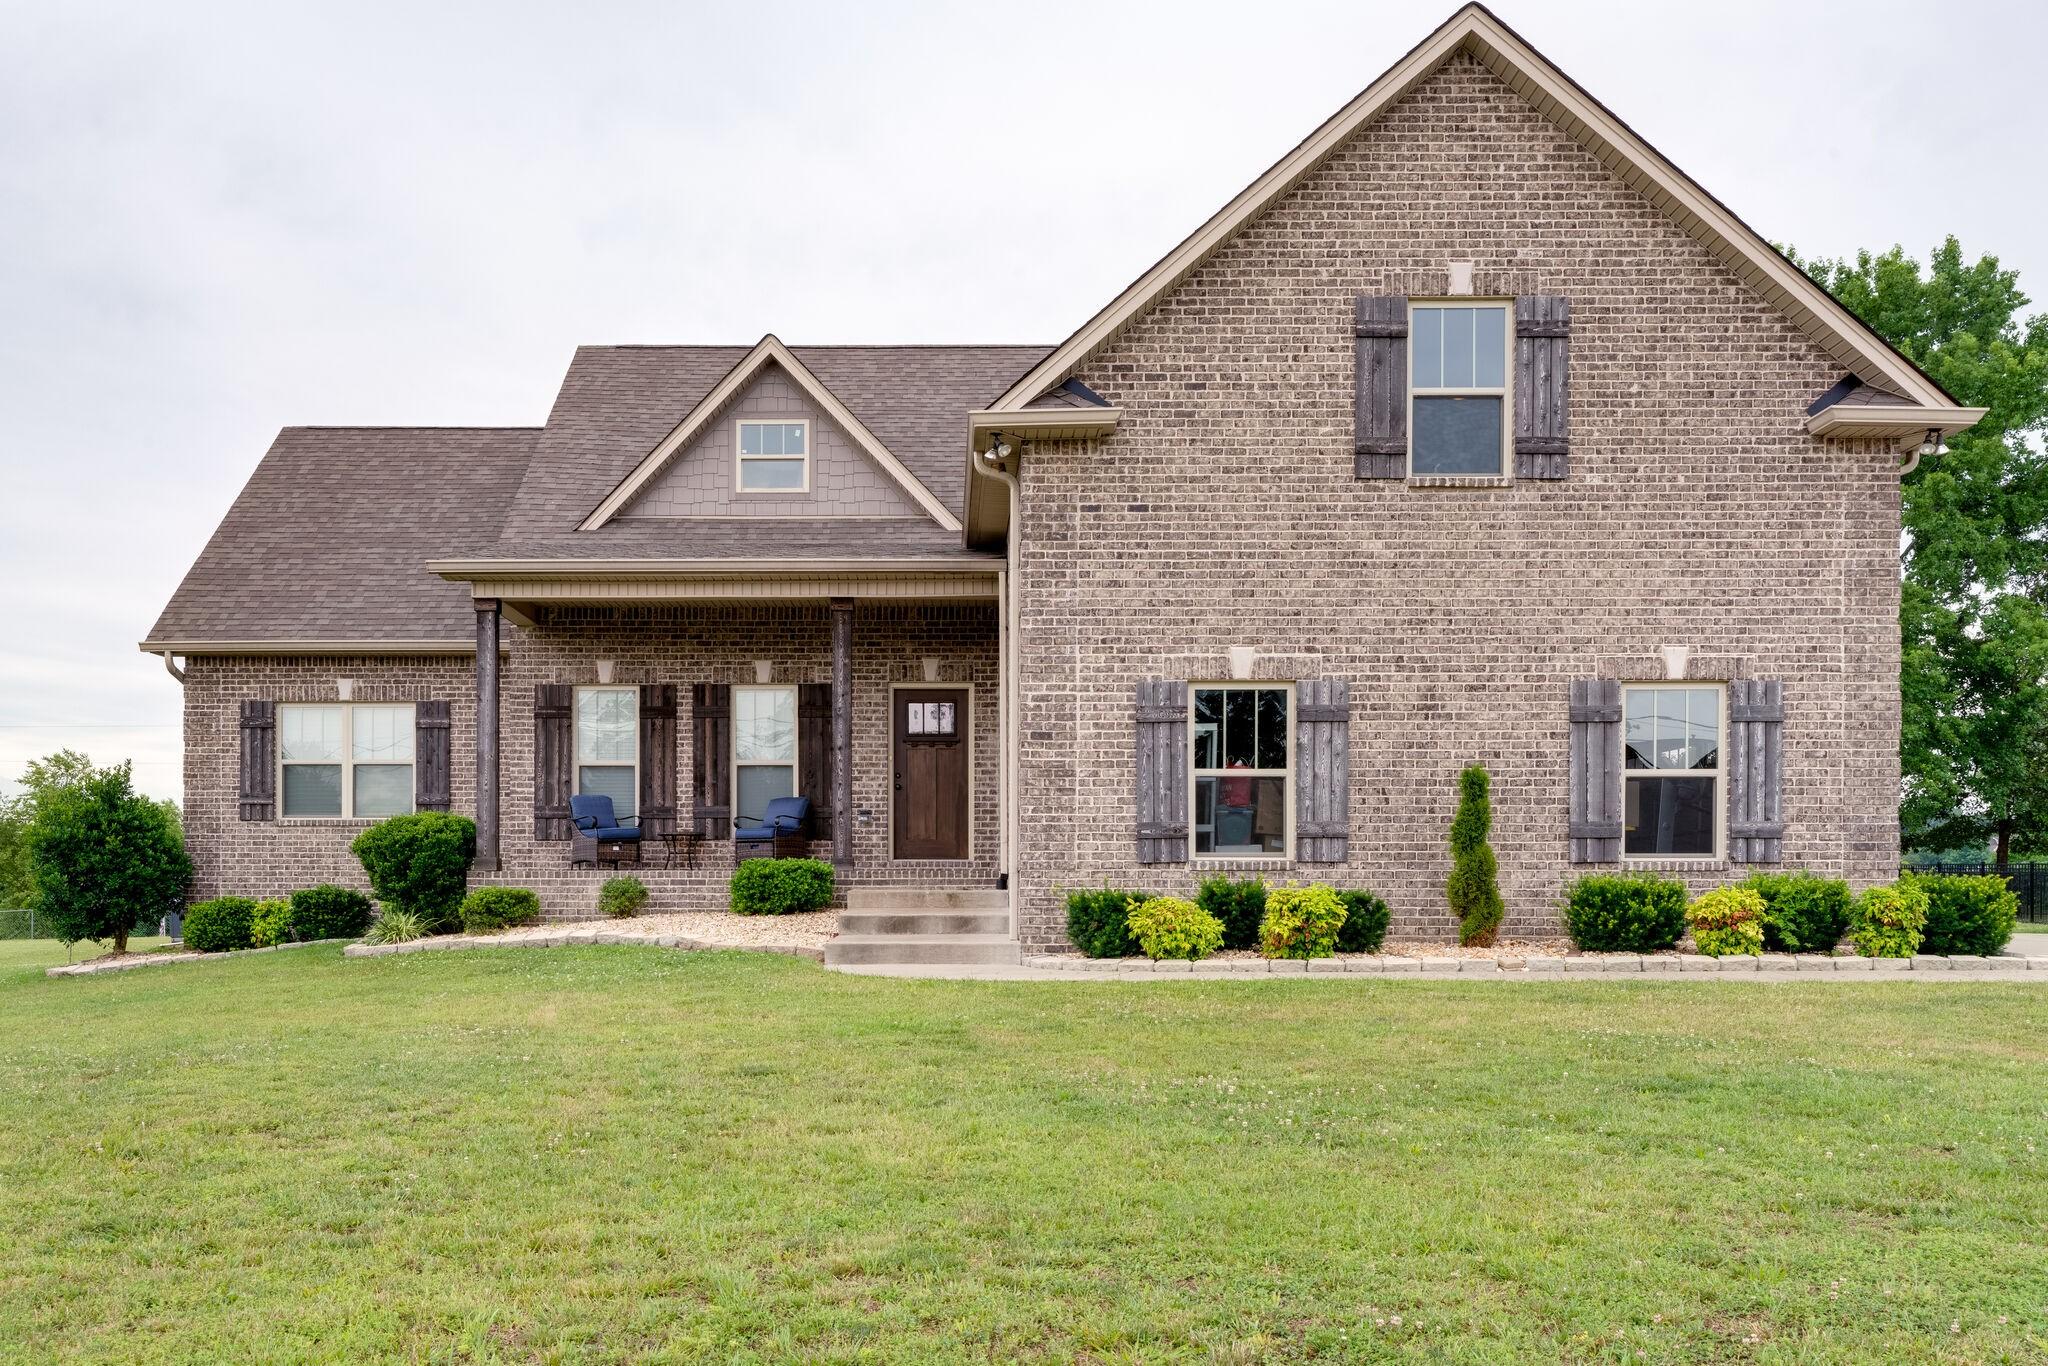 1068 Carrs Creek Blvd Property Photo - Greenbrier, TN real estate listing